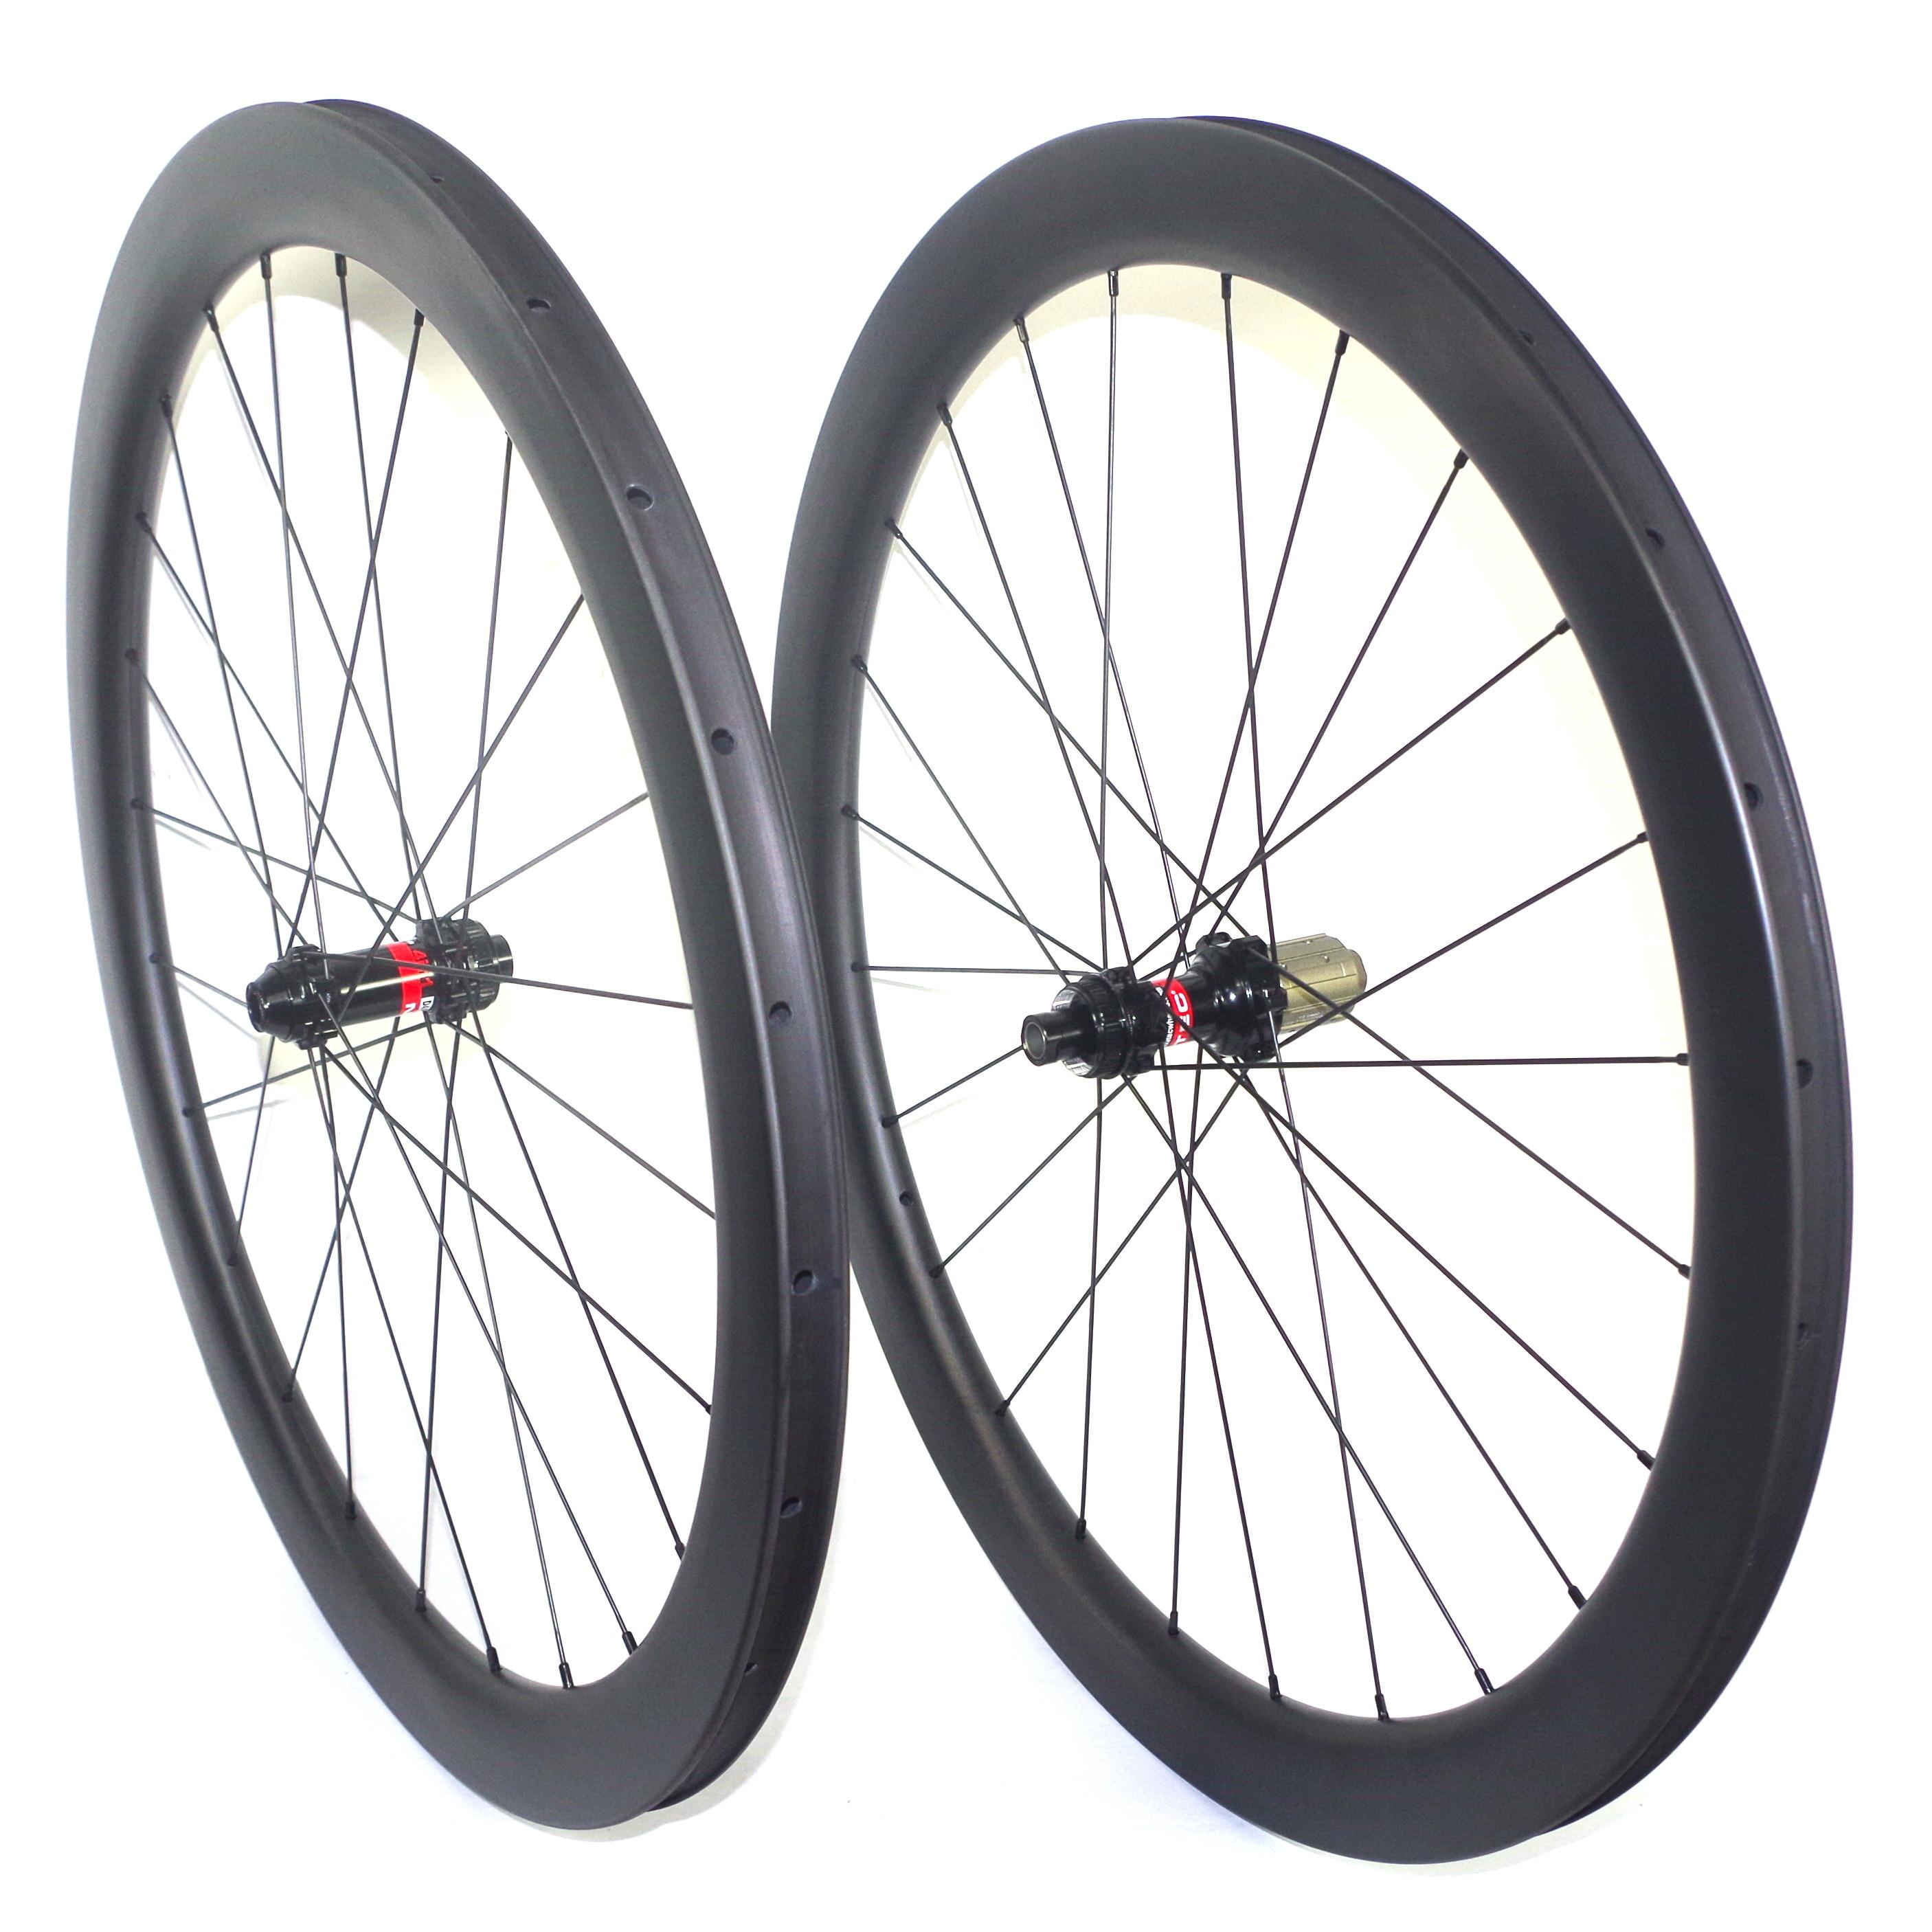 Carbon Wheelset 700C Clincher Disc Brake 88mm Carbon Road Cyclocross Bike Wheels